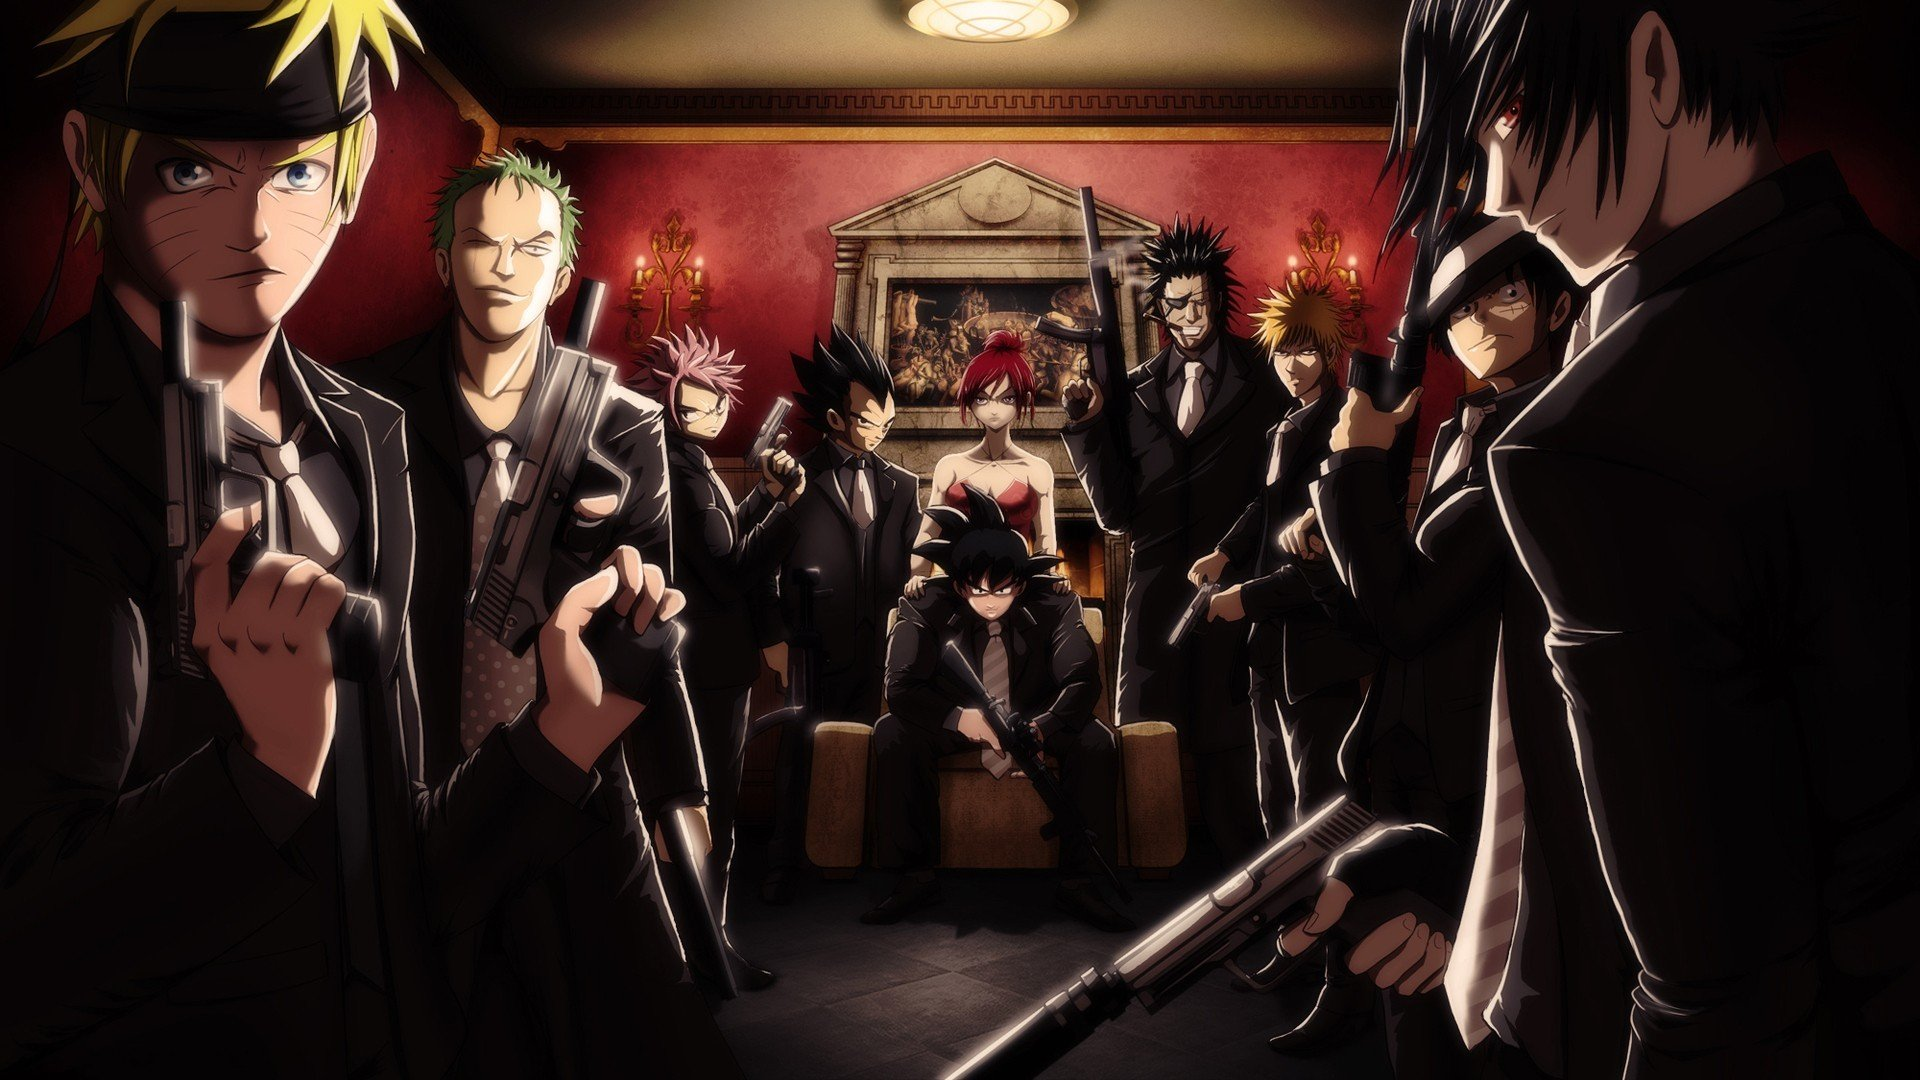 anime characters anime hd wallpaper 1920x1080 1253jpg 1920x1080